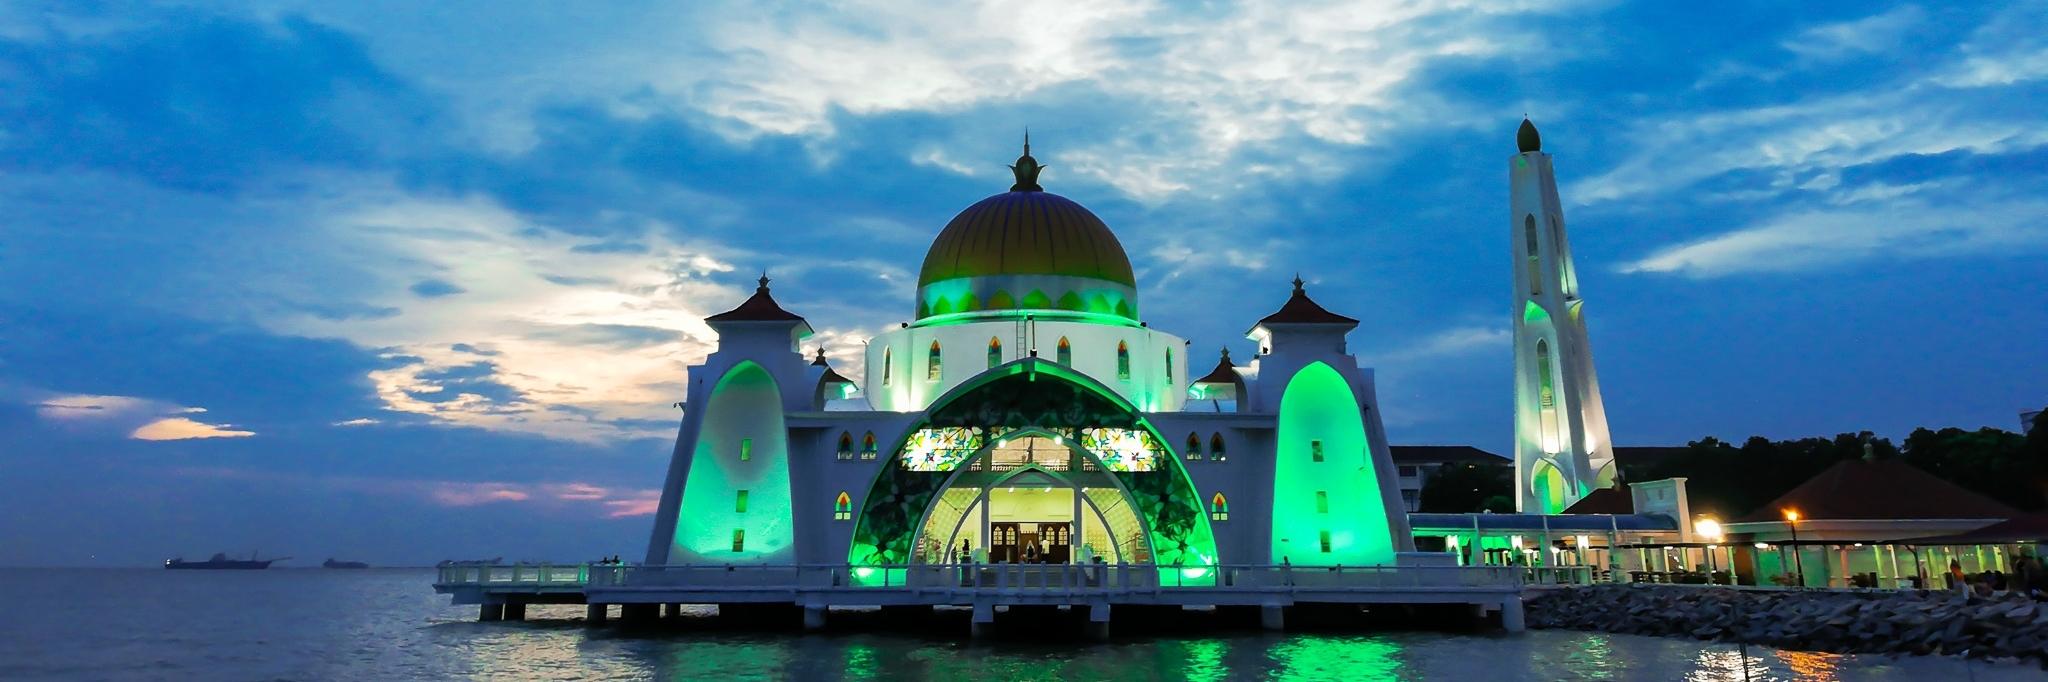 https://gody.vn/blog/mibukyoshiro19917286/post/du-lich-bui-tu-tuc-7n6d-65tr-o-malaysia-penang-kuala-lumpur-melaka-lost-in-malaysia-1254